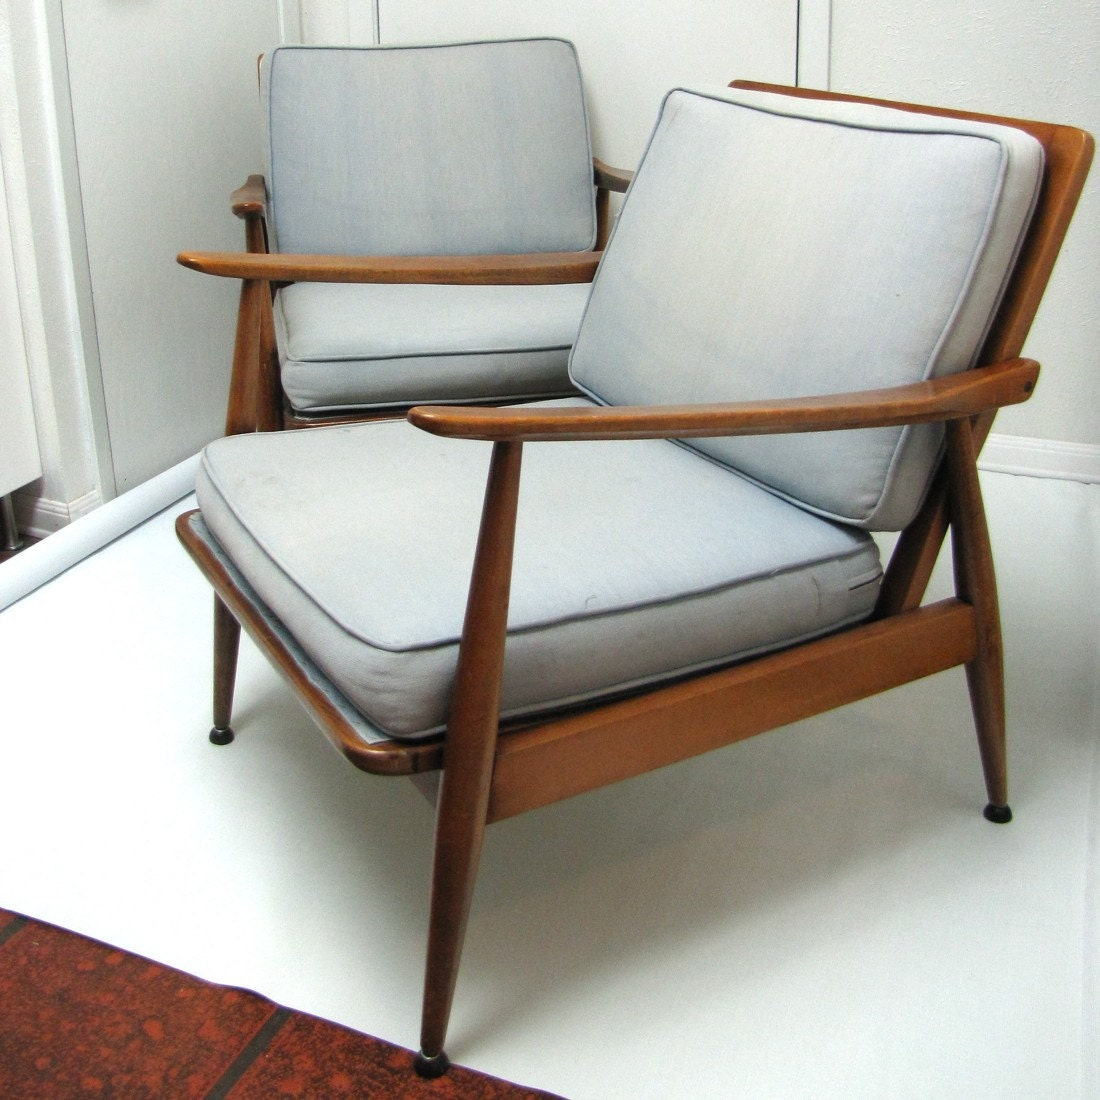 Vintage pair danish modern arm chairs flat pack construction for Danische mobel hamburg